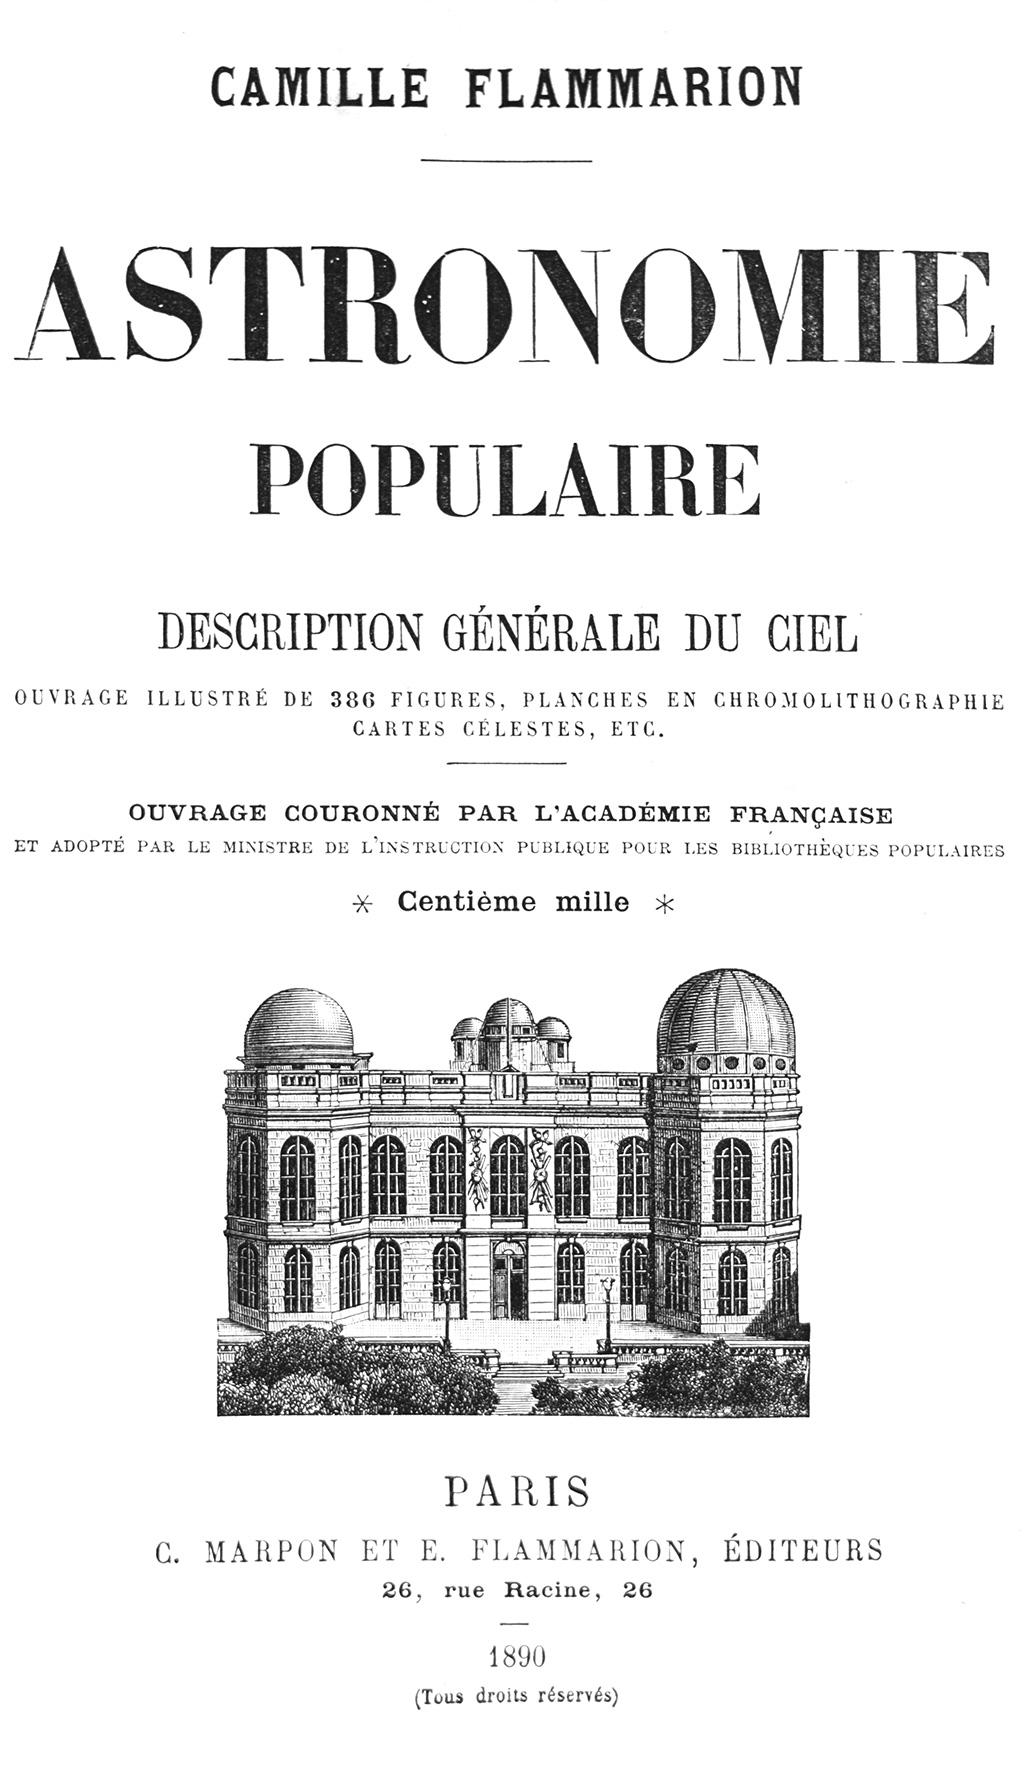 Astronomie Populaire, Camille Flammarion, 1890